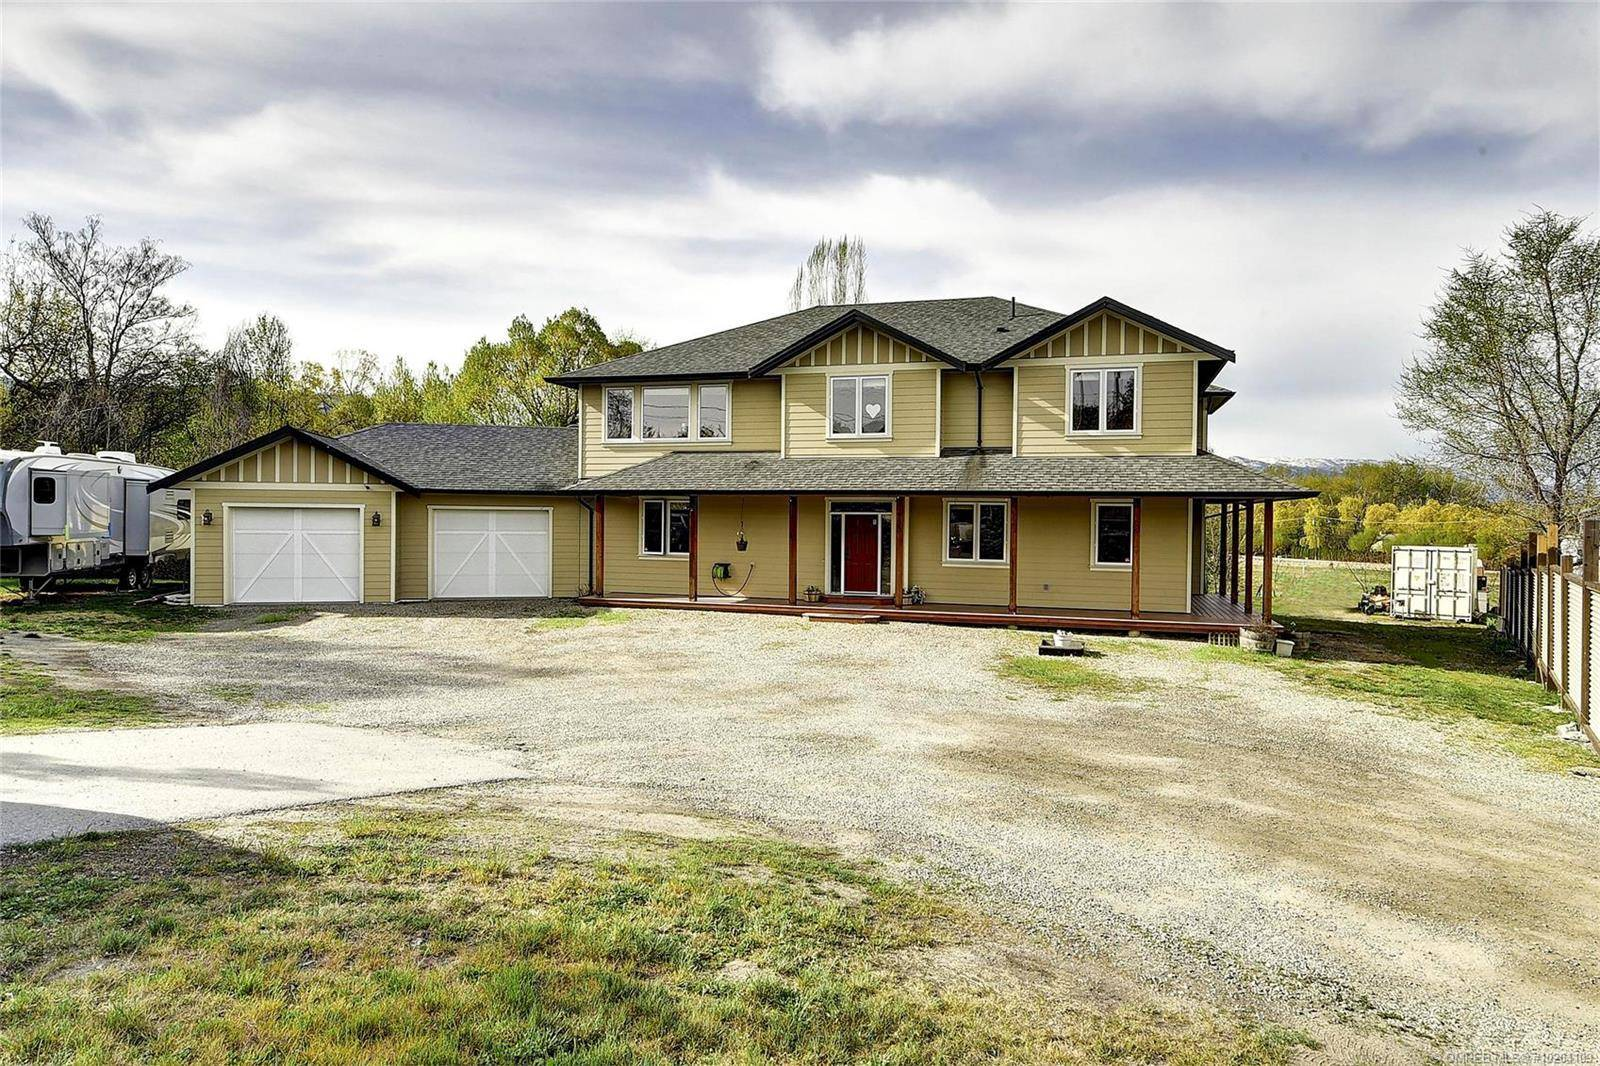 House for sale at 2195 Klo Rd Kelowna British Columbia - MLS: 10204109